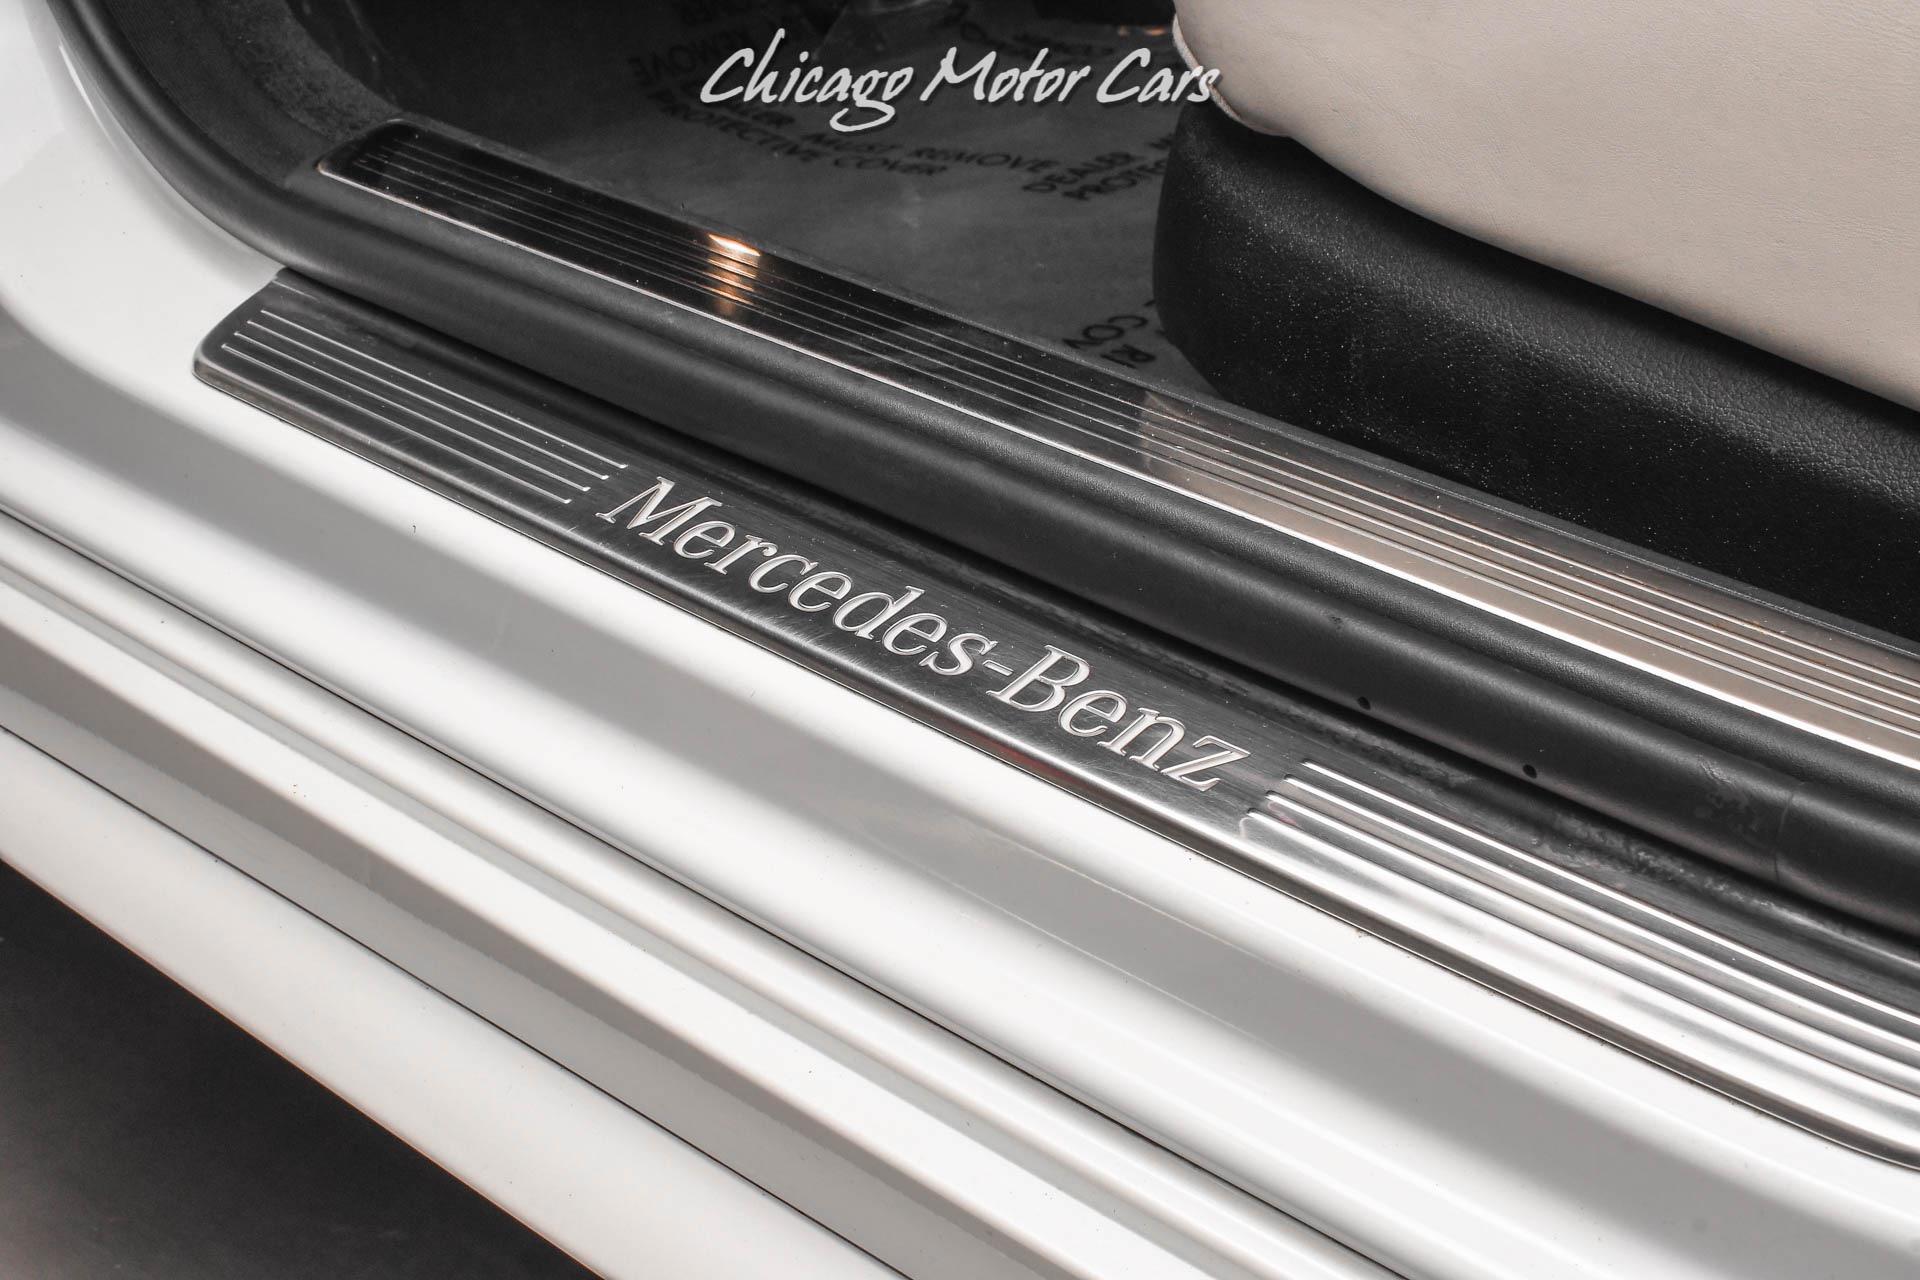 Used-2019-Mercedes-Benz-S560-4Matic-Sport-Sedan-MSRP-122890-PREMIUM-PACKAGE-1-FULL-RADAR-SYSTEM